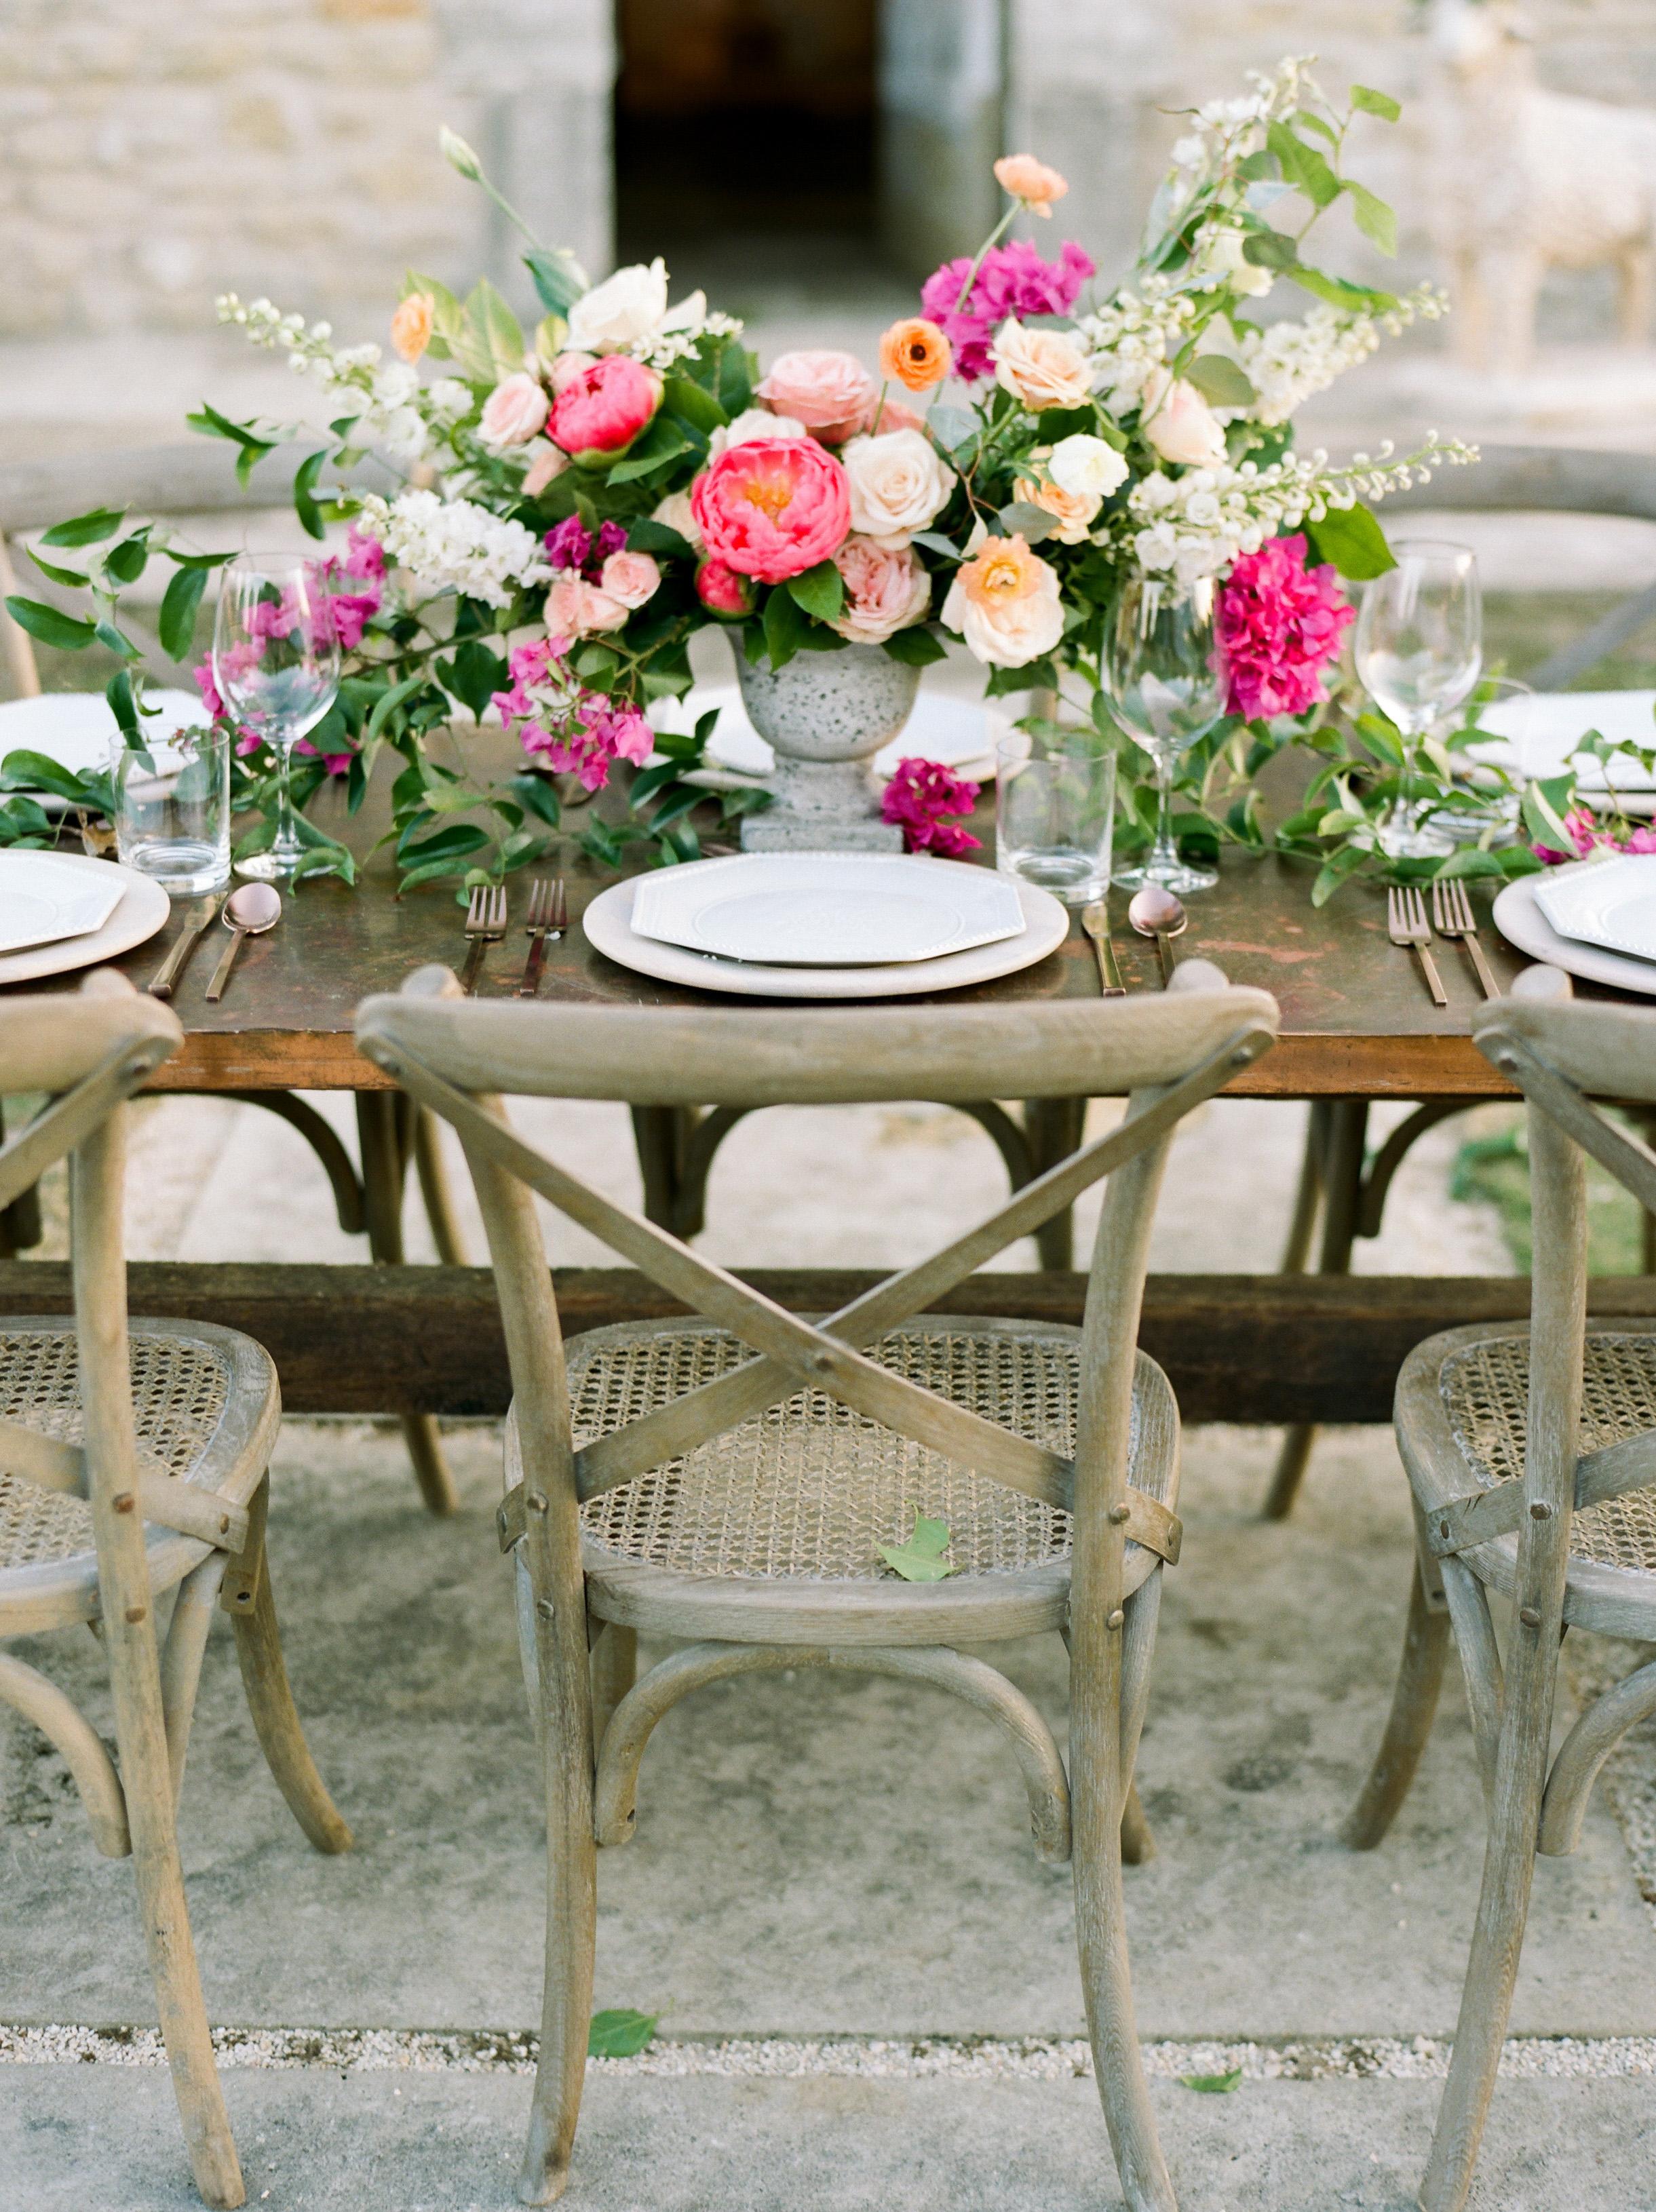 Top-Houston-Wedding-Photographer-Dana-Fernandez-Photography-The-Clubs-At-Houston-Oaks-Country-Club-Belle-Events-Film-Fine-Art-Destination-22.jpg